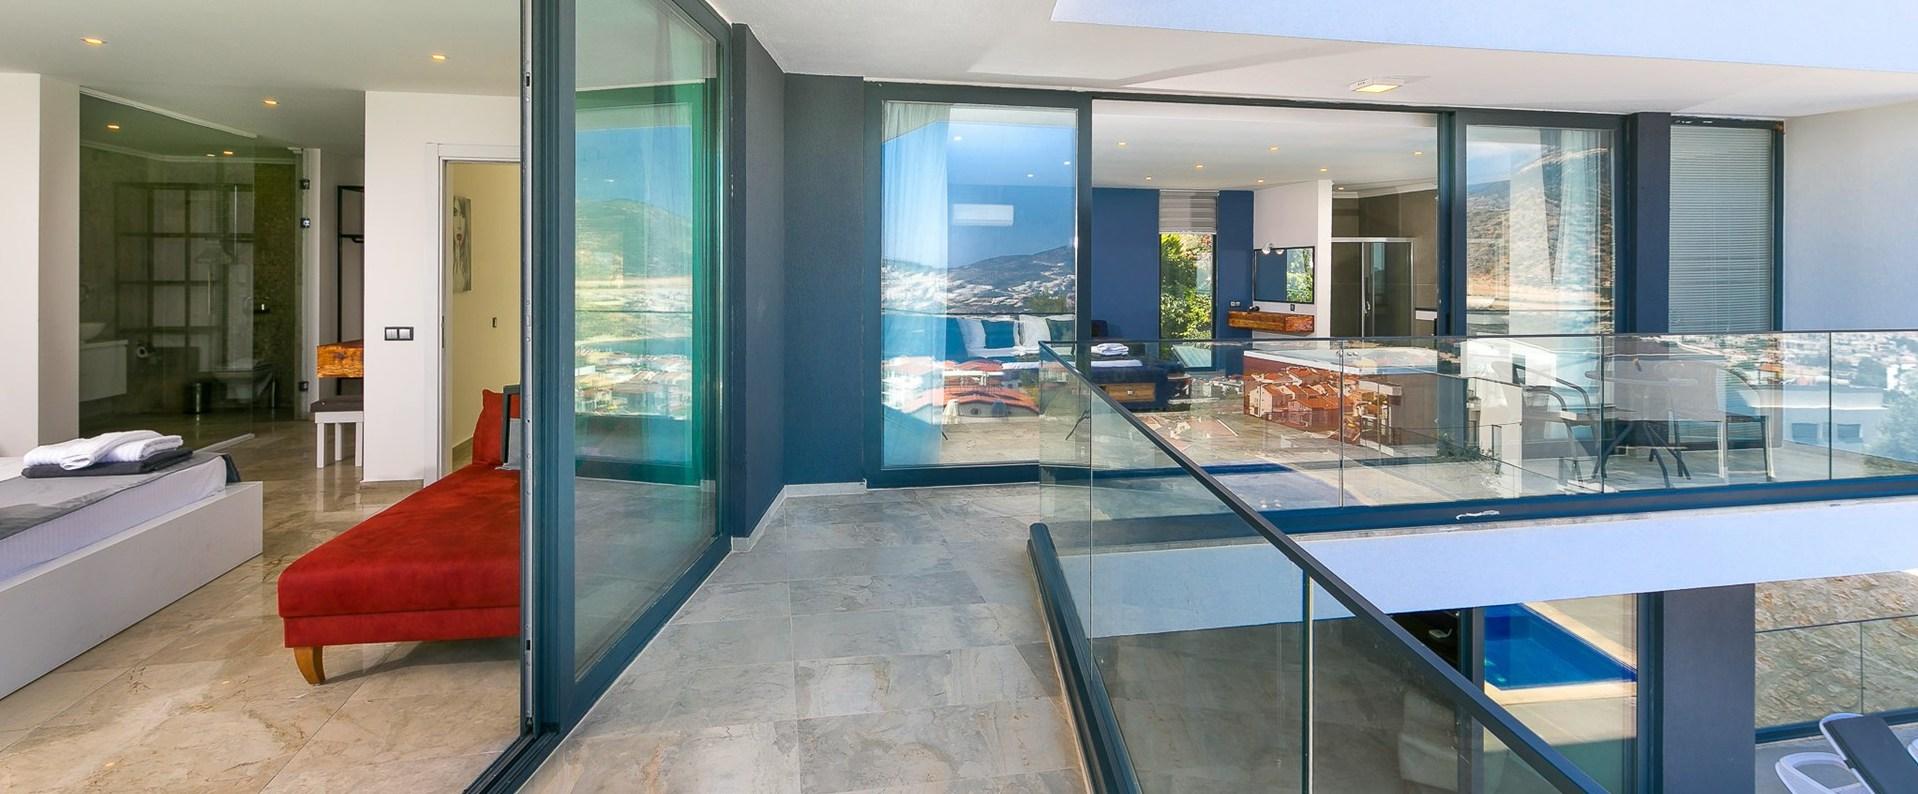 luxury-bedrooms-sea-view